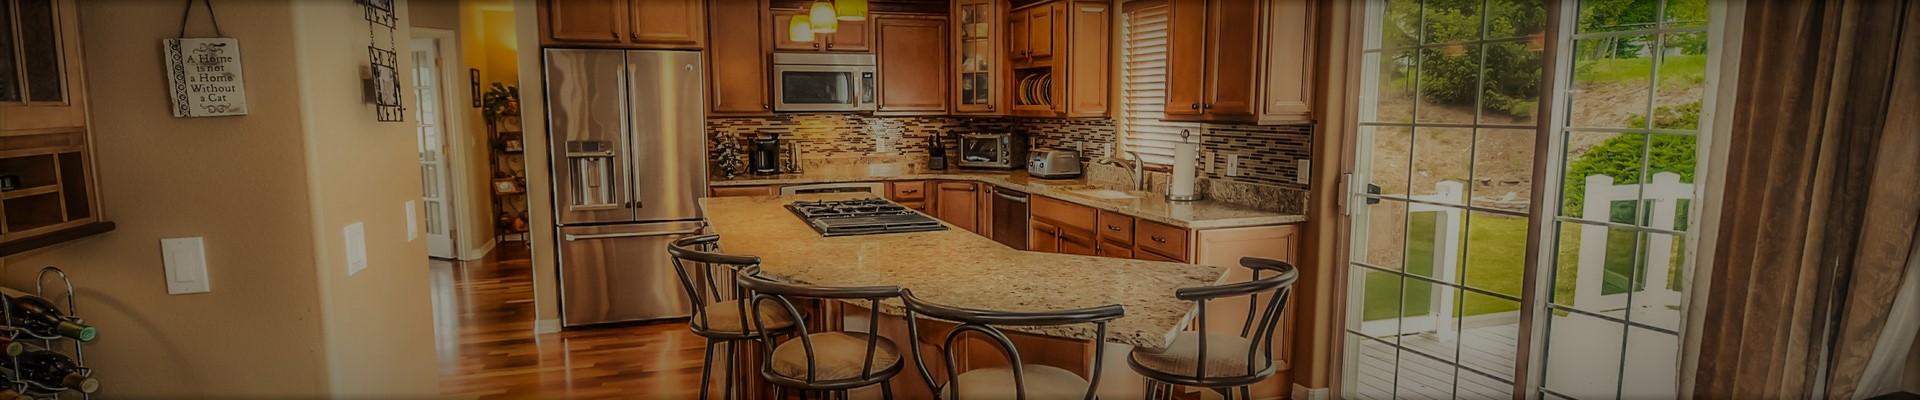 residential remodeling banner - sunscreen